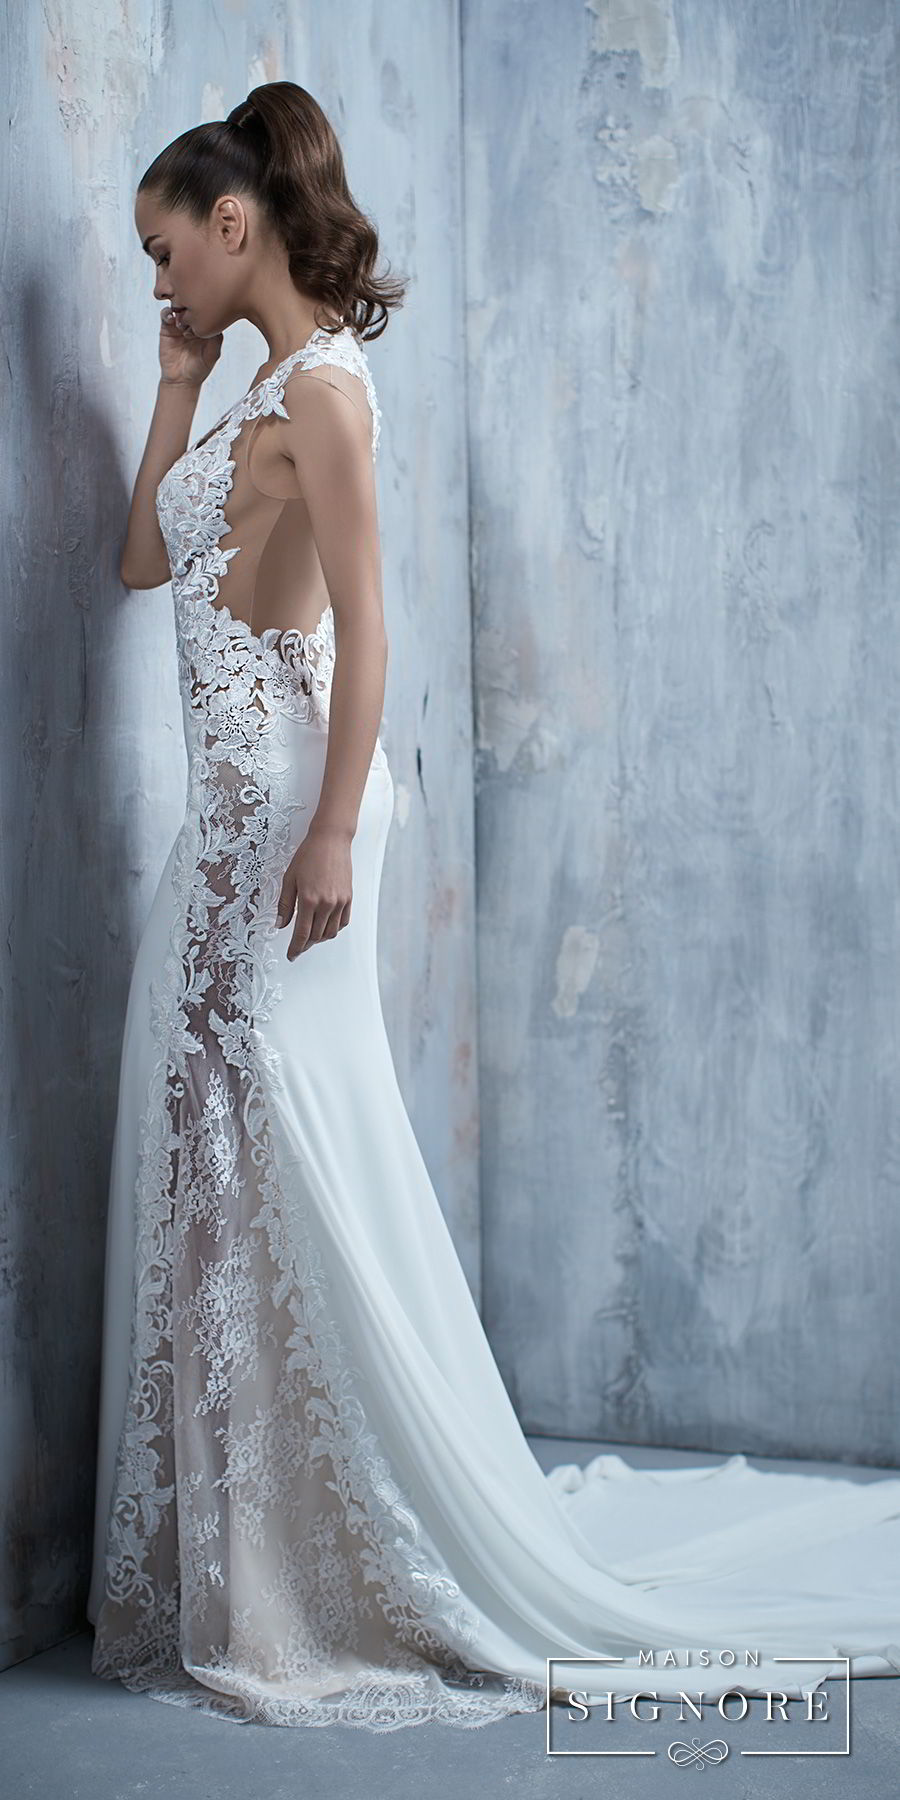 maison signore 2017 bridal cap sleeves deep v neck heavily embellished elegant fit and flare wedding dress chapel train (tessa) sdv